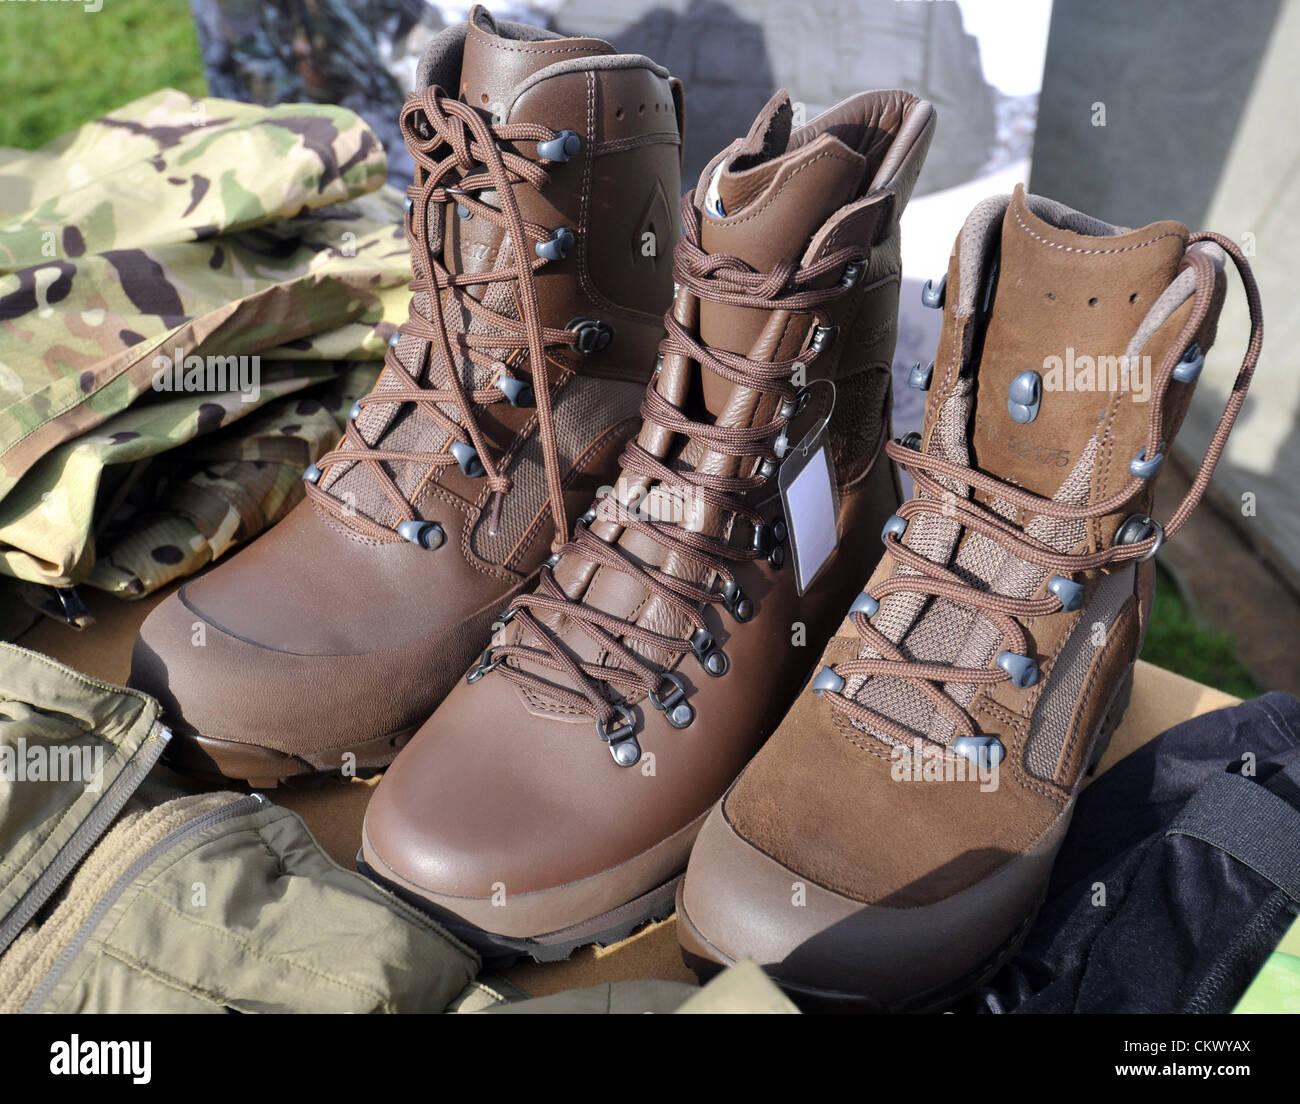 Chaussures - Bottines Verkhovna JgNprY9z